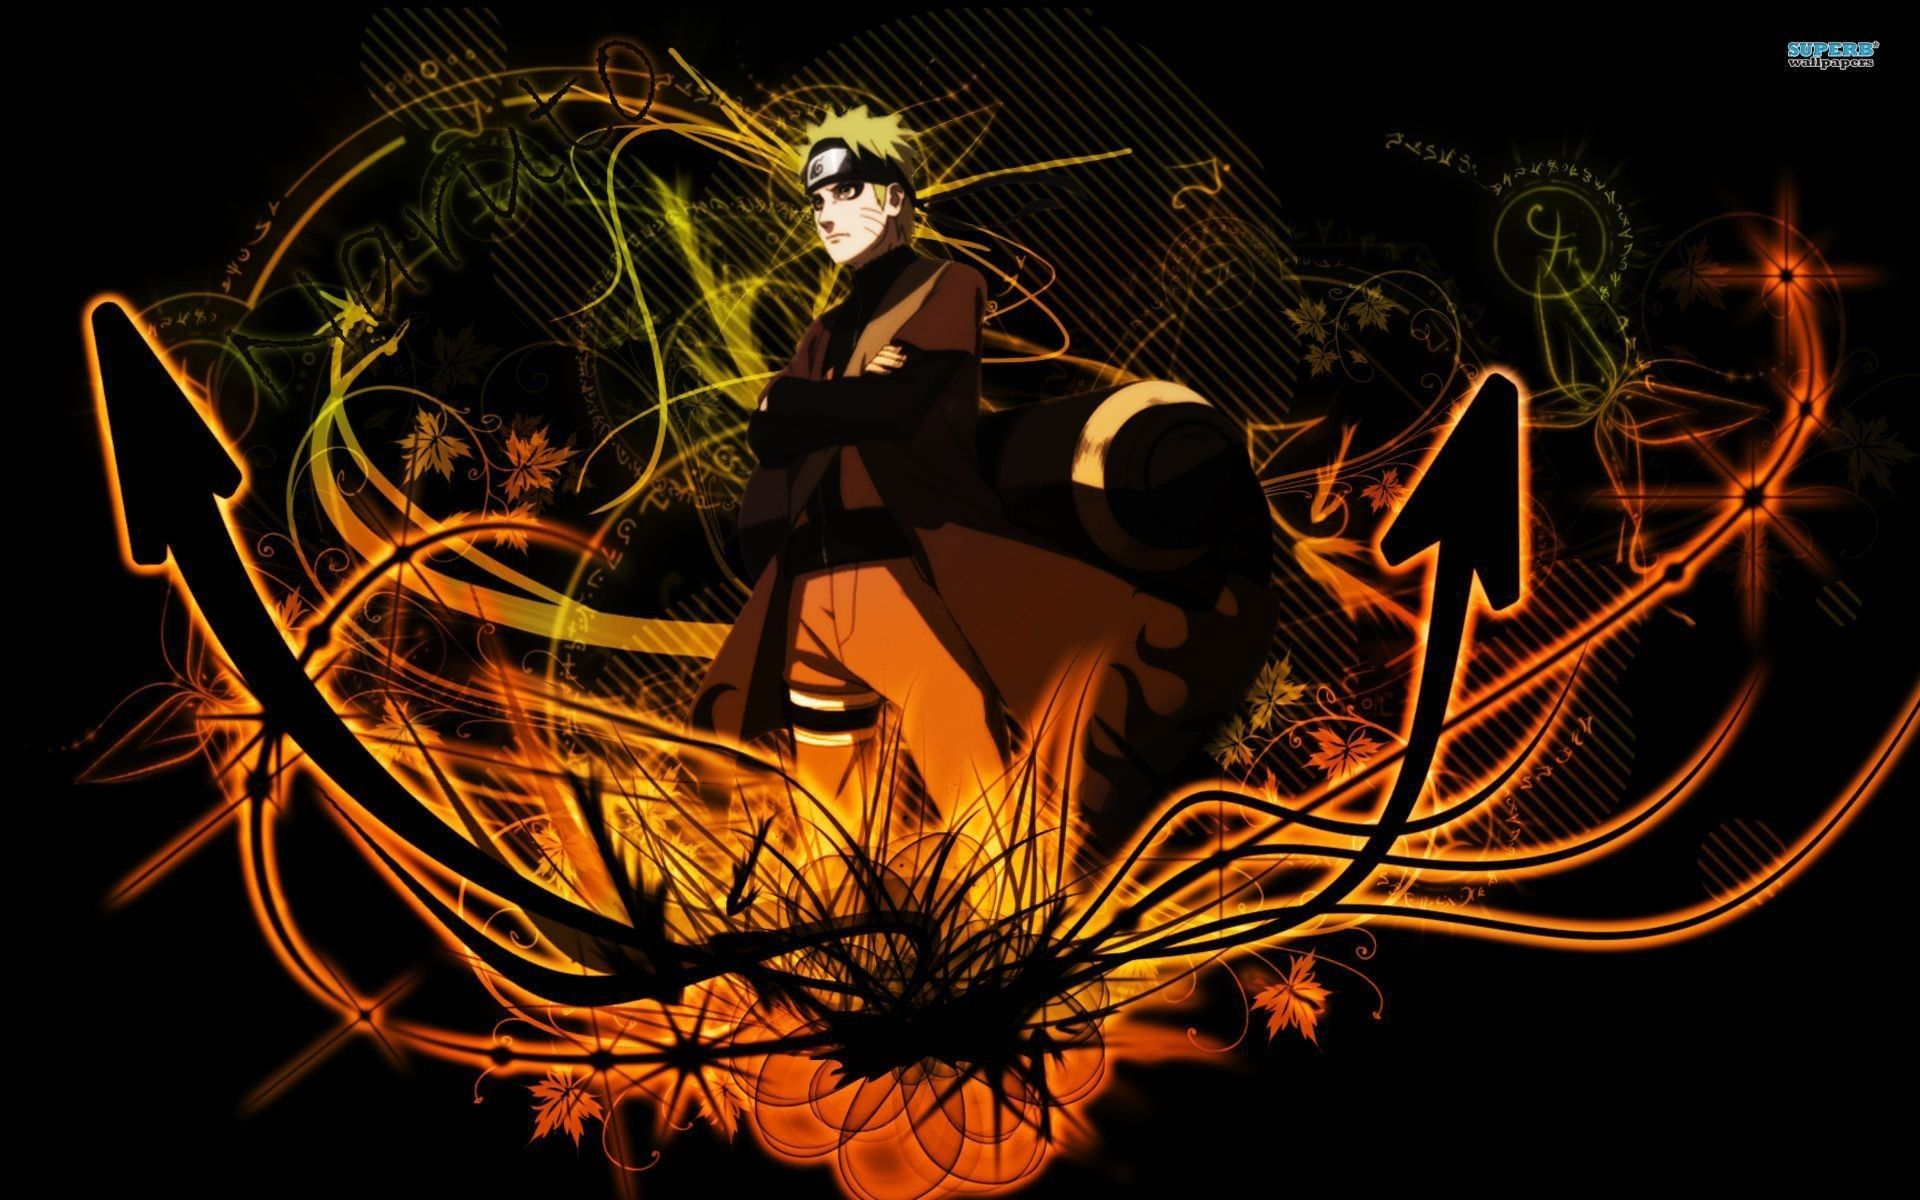 1920x1200 Gambar Hd Wallpapers Backgrounds Naruto Wallpaper Naruto And Sasuke Wallpaper Anime Wallpaper